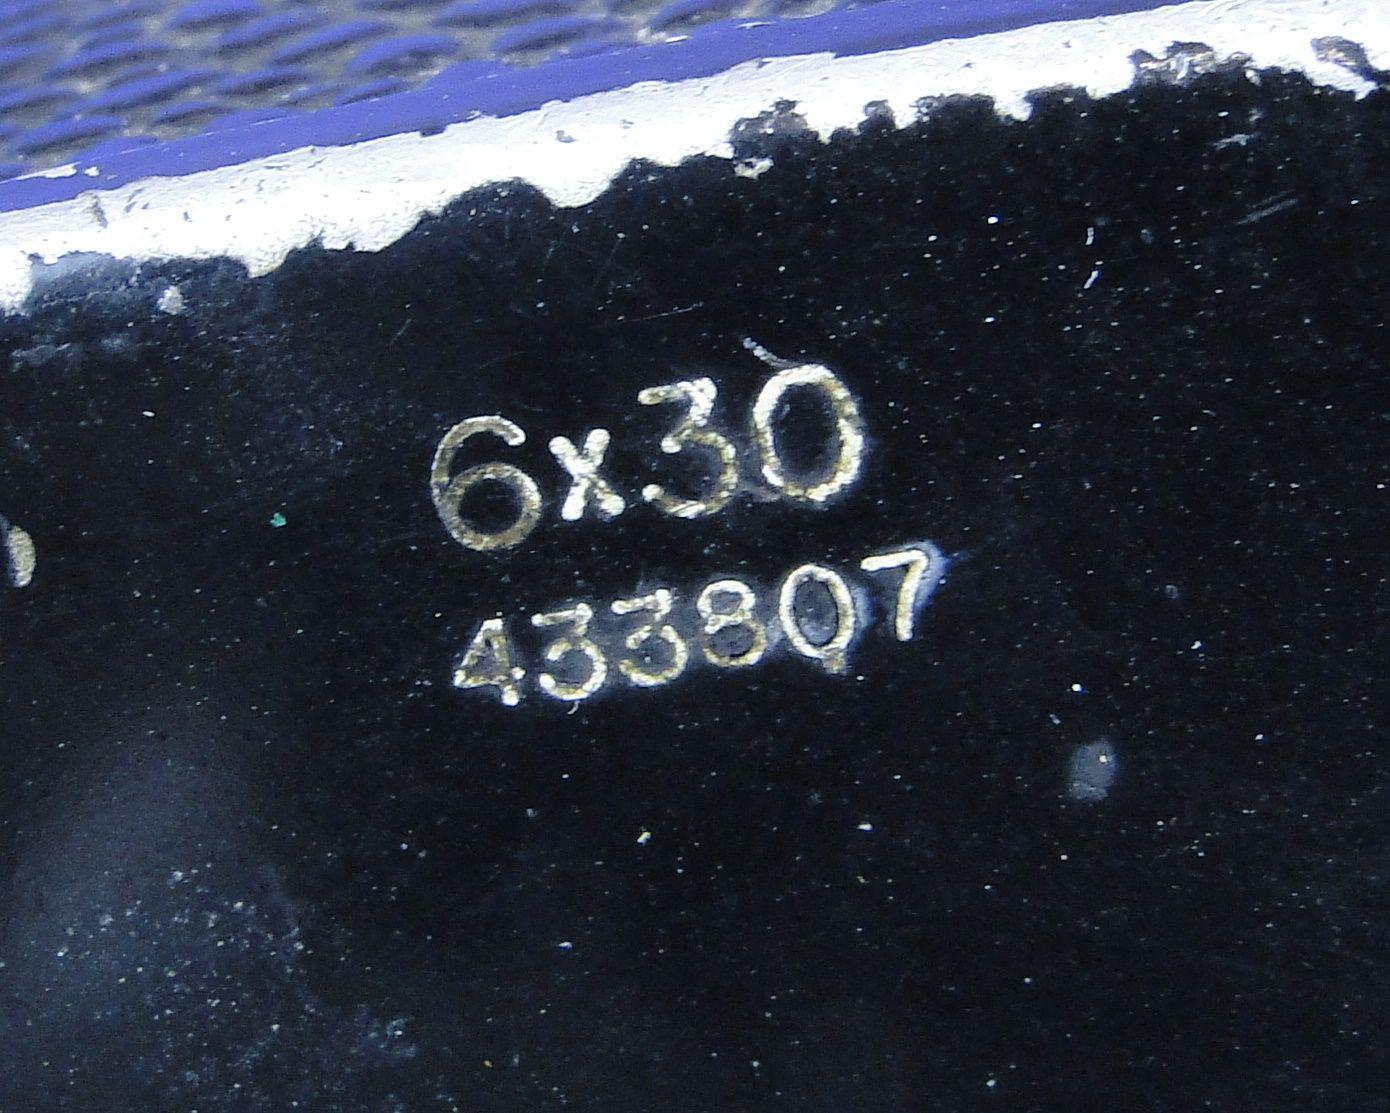 DSC03616.JPG (1390×1113)